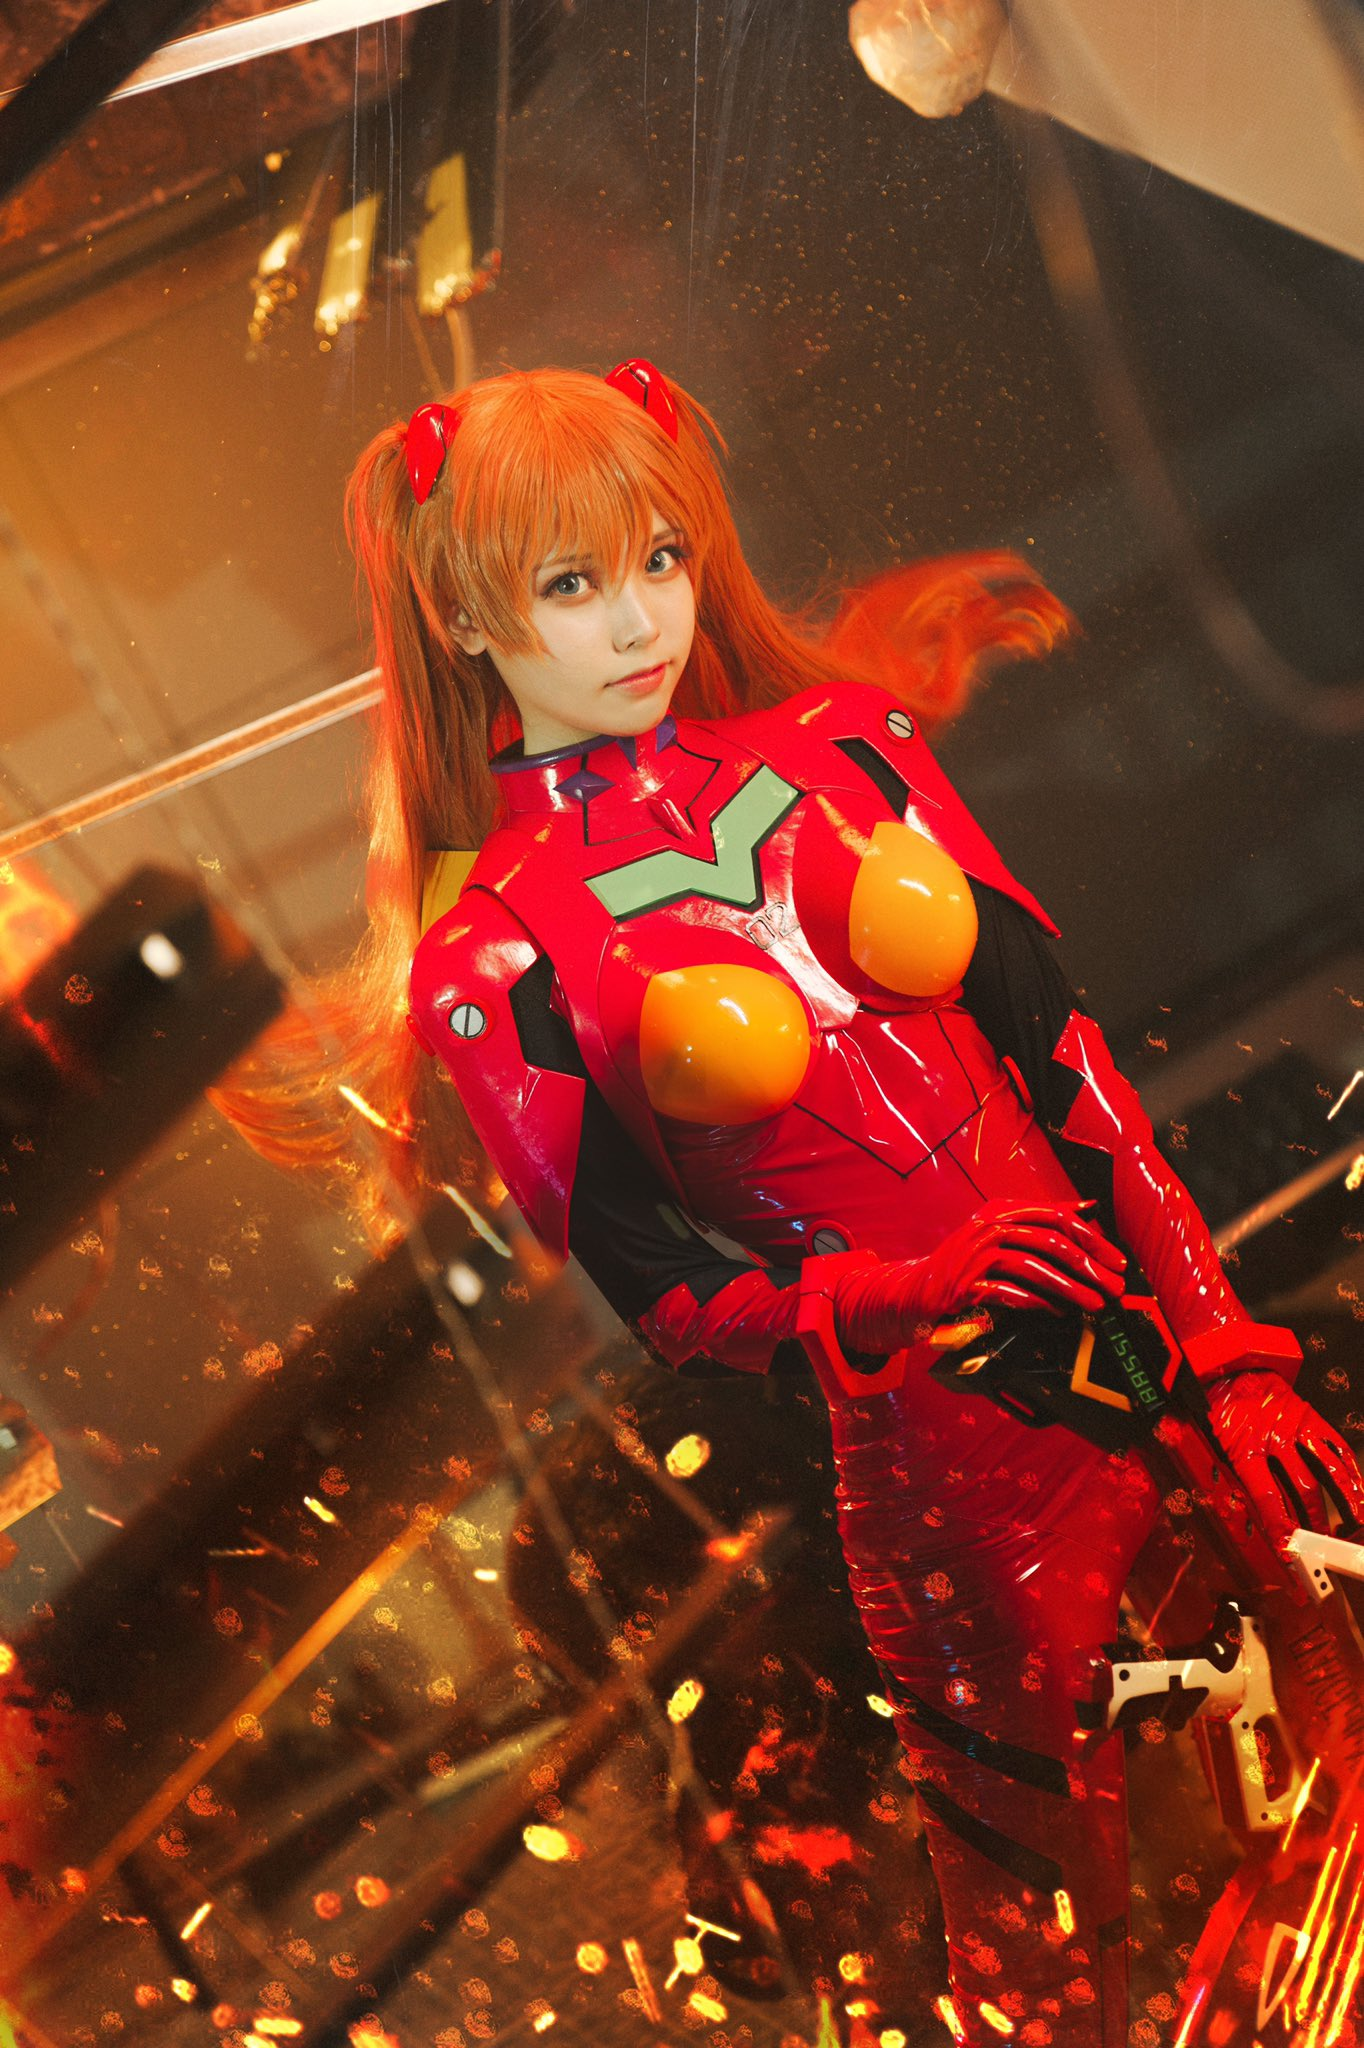 Liyuu as Asuka from Evangelion